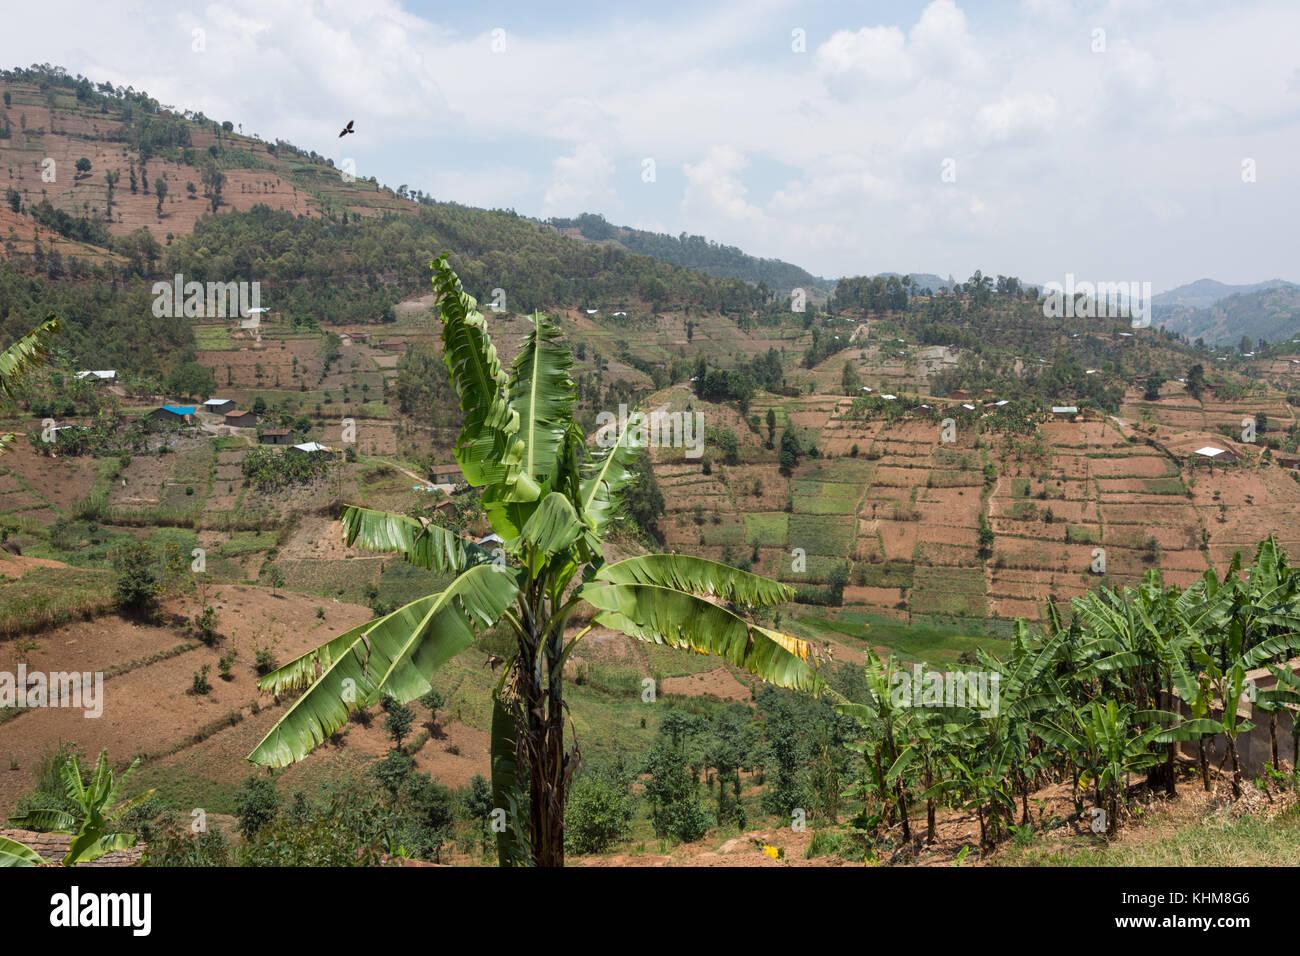 Walking back from Mountain Gorilla trek Rwanda - Stock Image